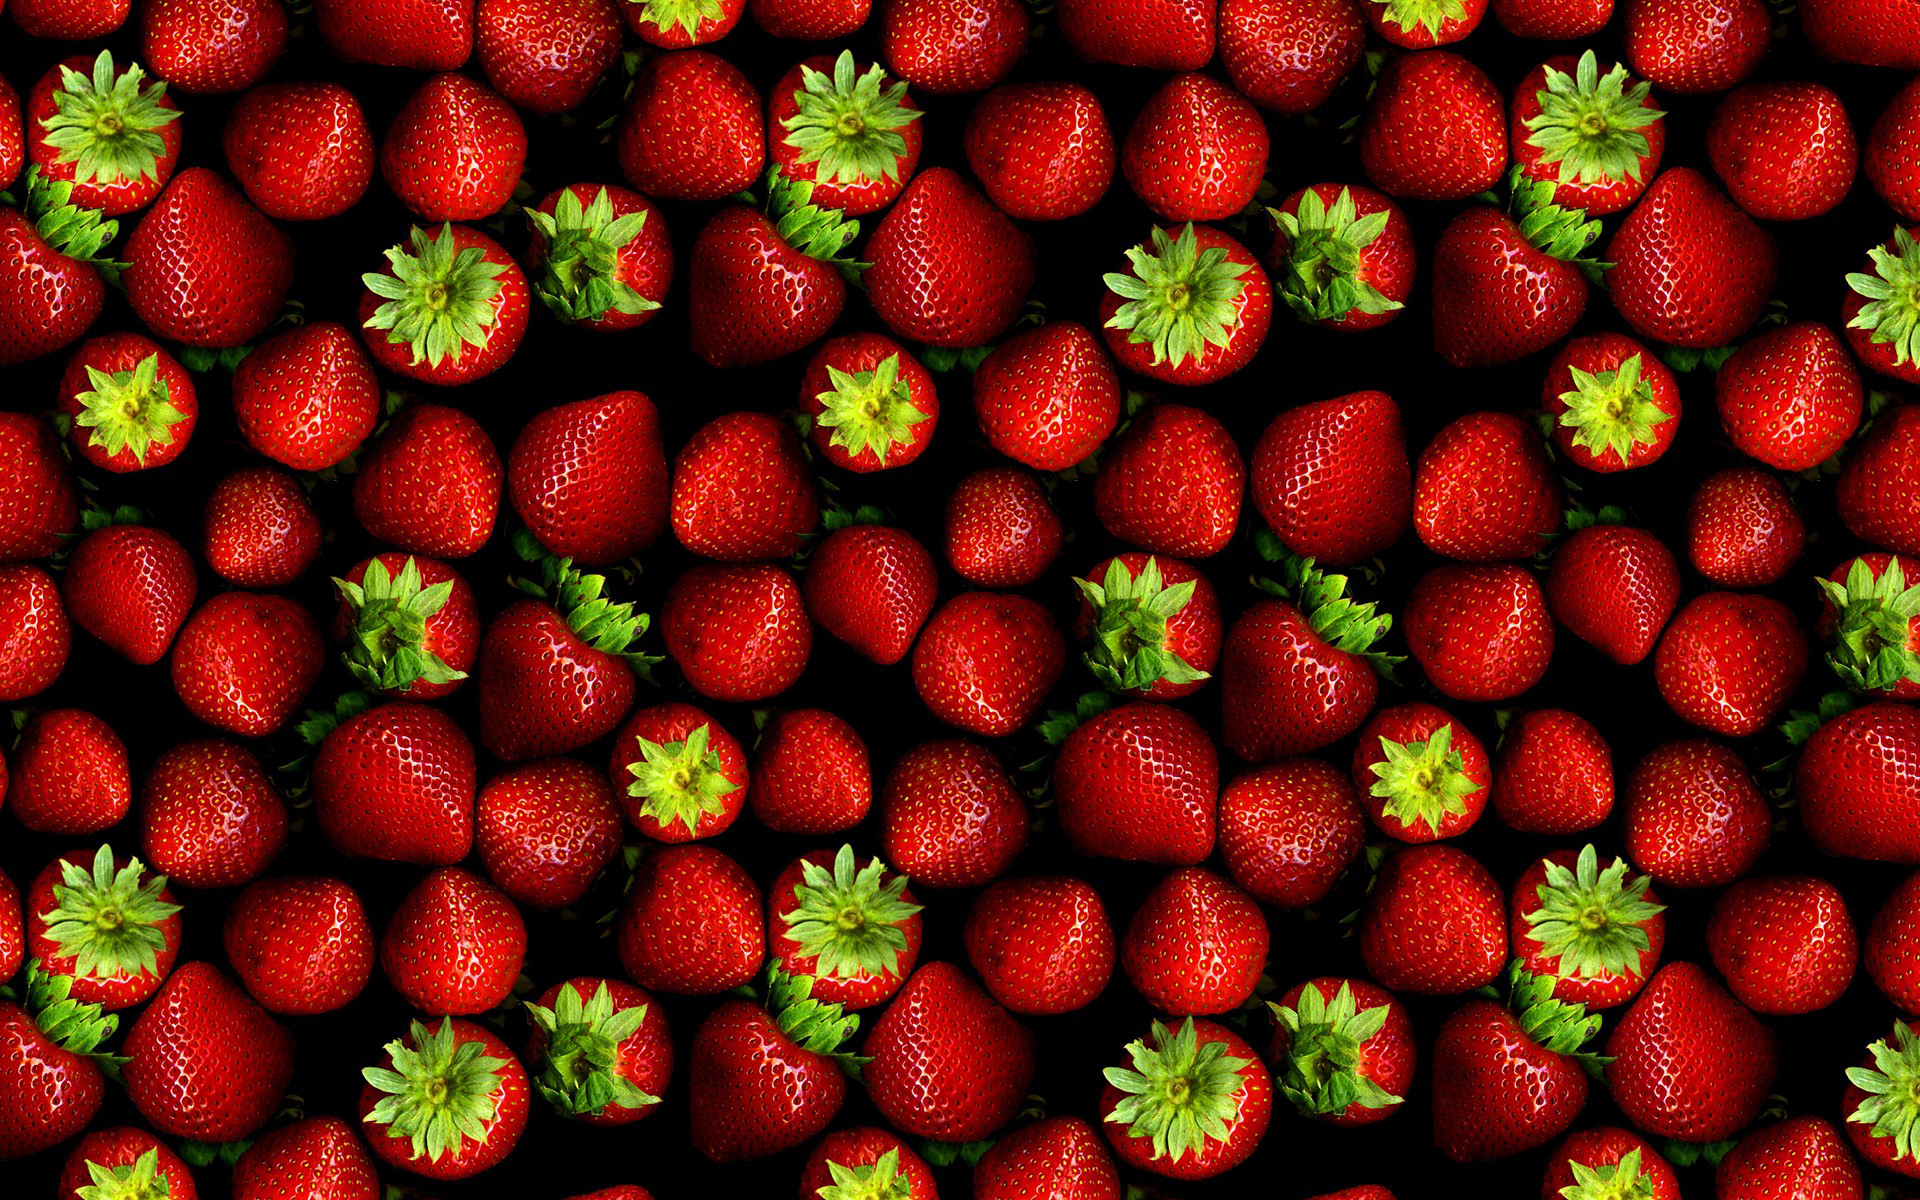 wallpapers strawberry desktop food 1920x1200 1920x1200